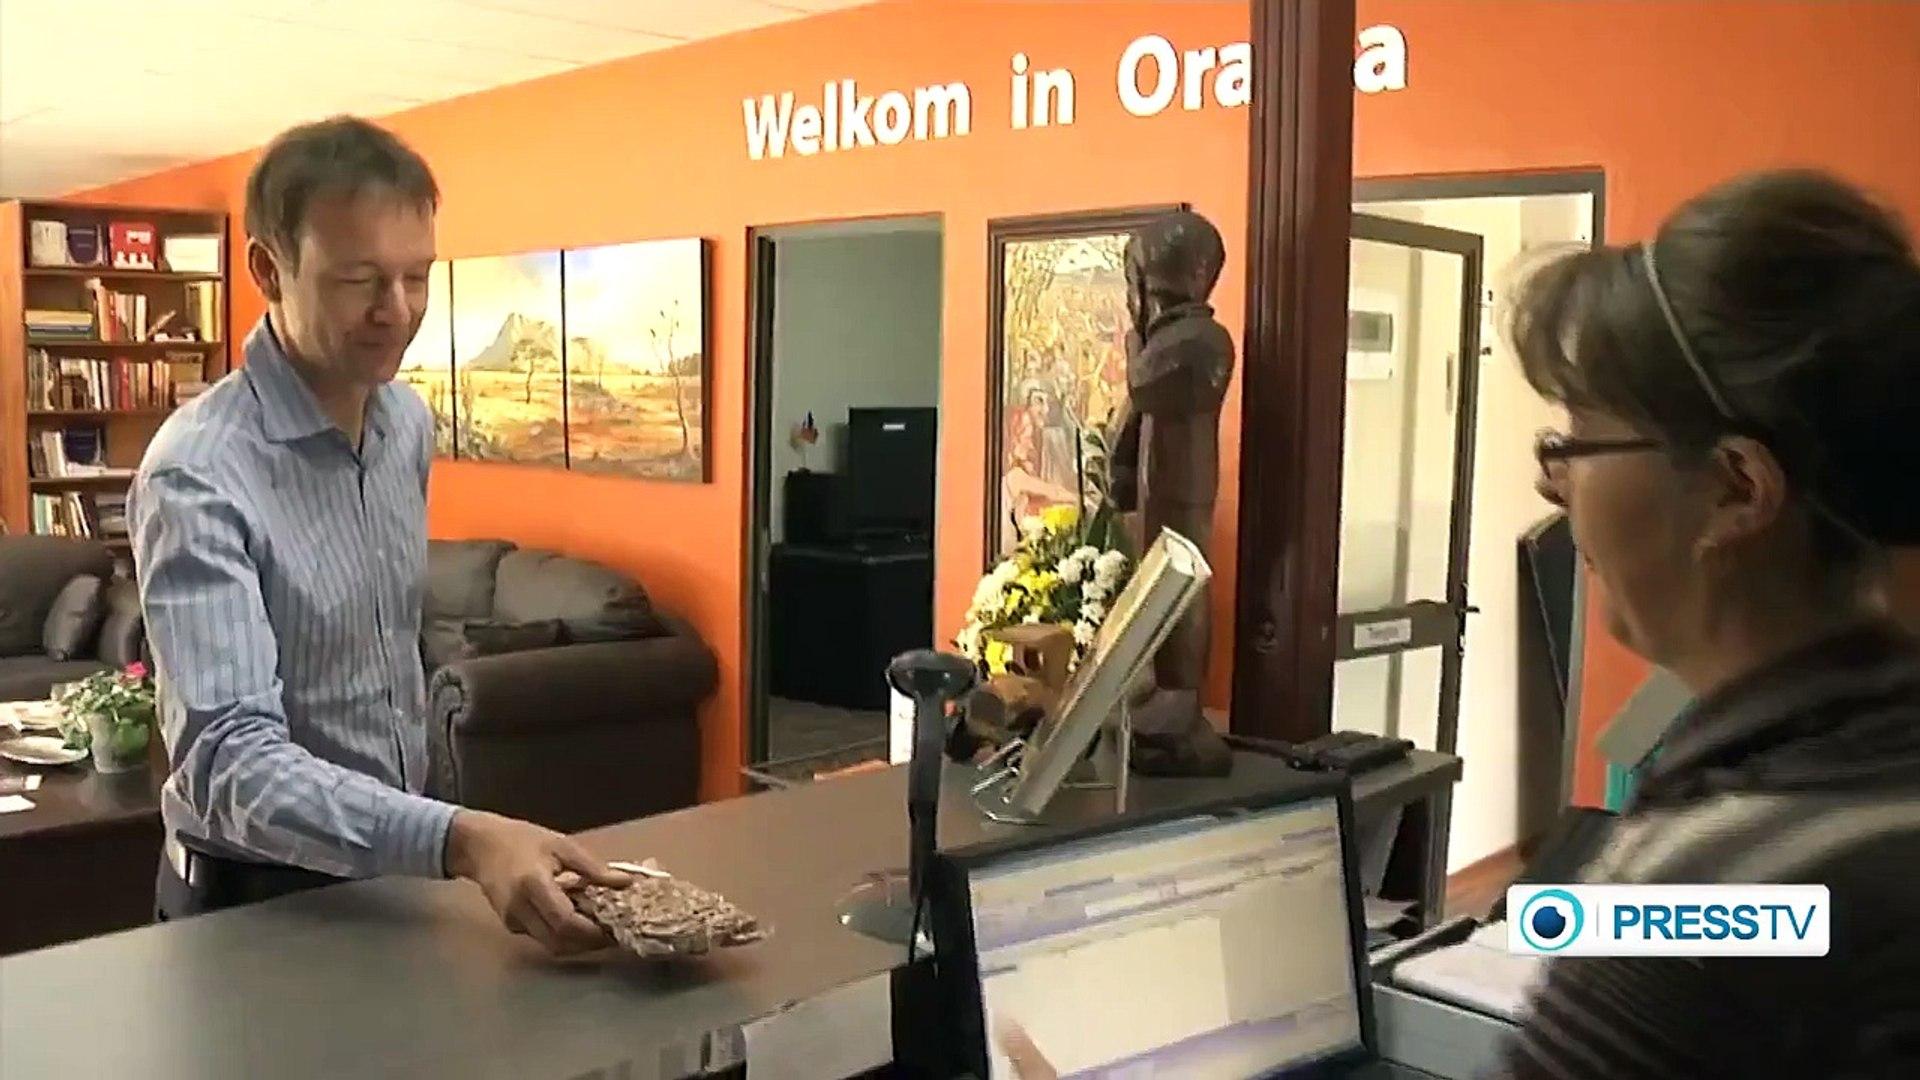 People cherish apartheid in South African town of Orania